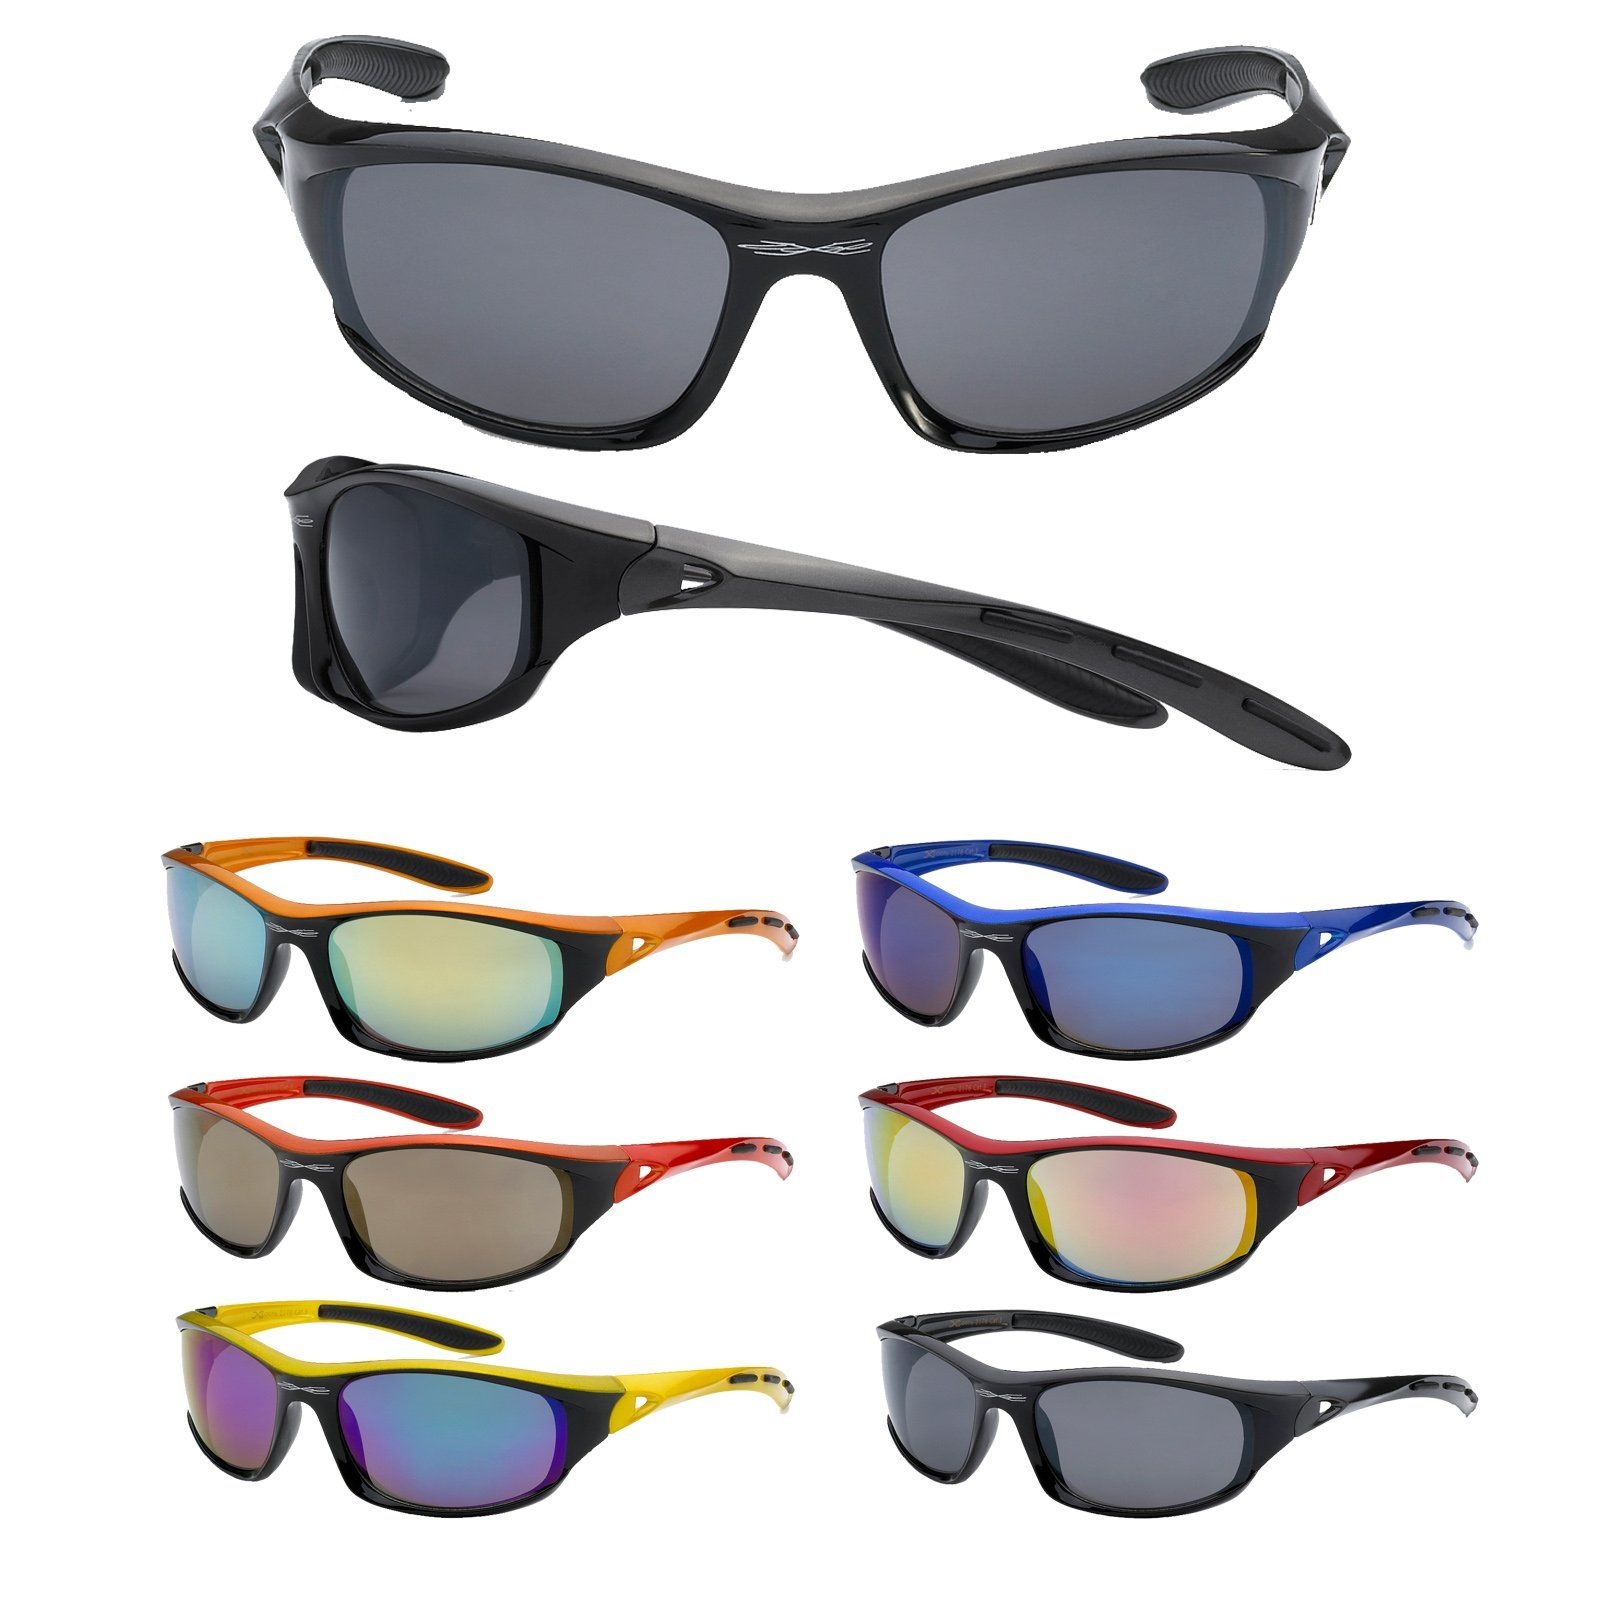 2 Men/'s Half Rim Sport Wrap Sunglasses Running Cycling Glasses UV400 Sun Shades